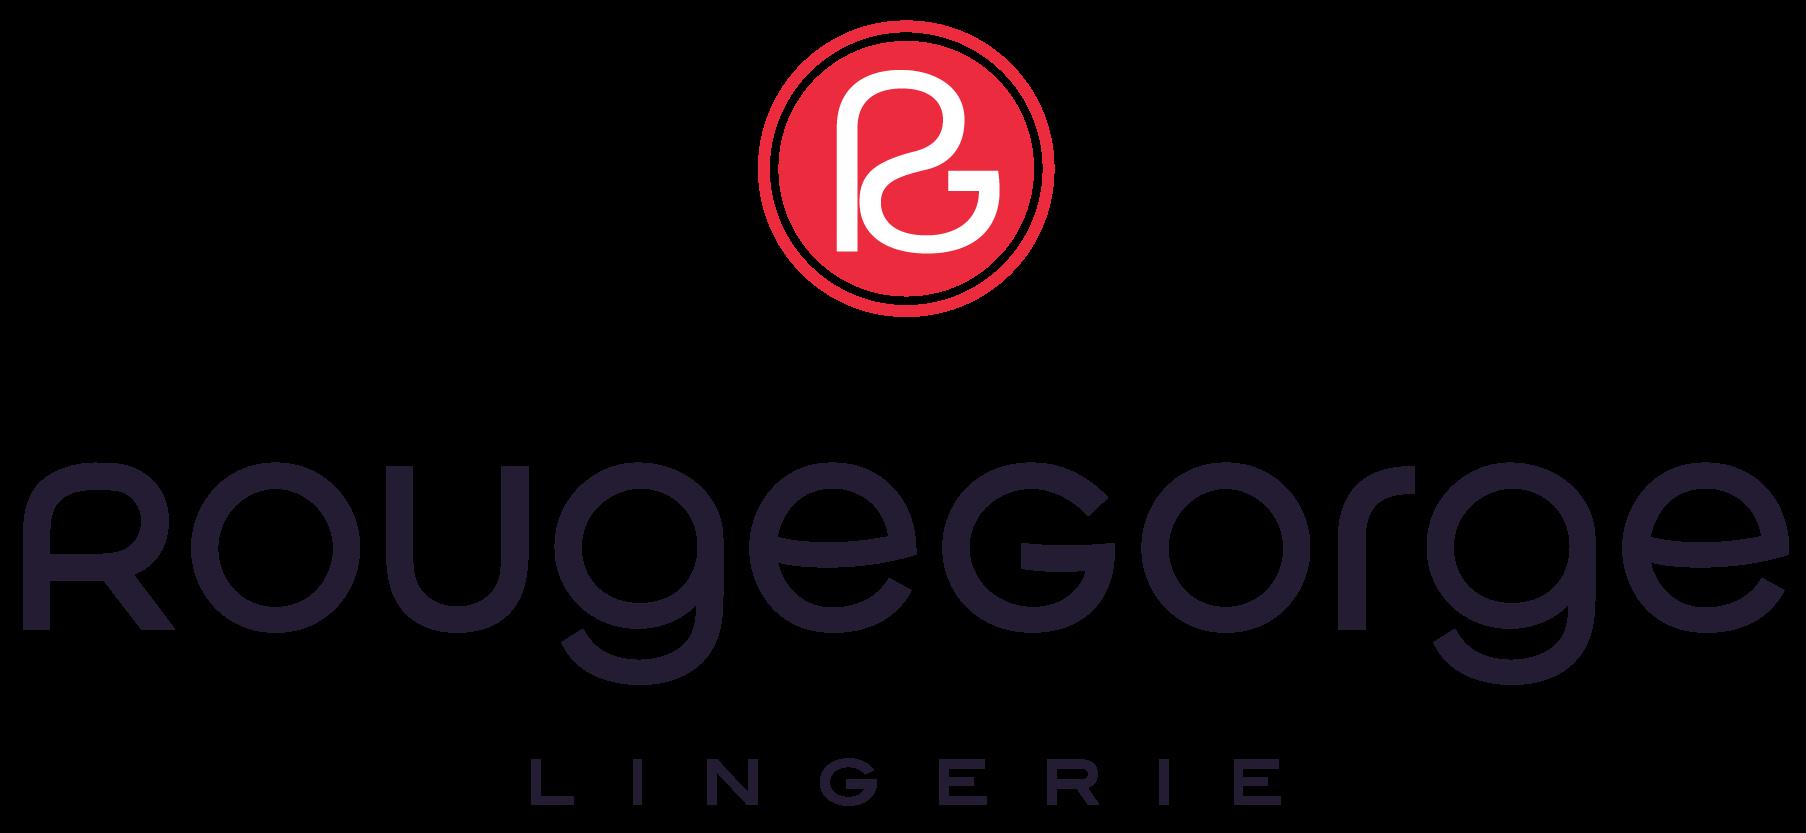 RougeGorge Lingerie